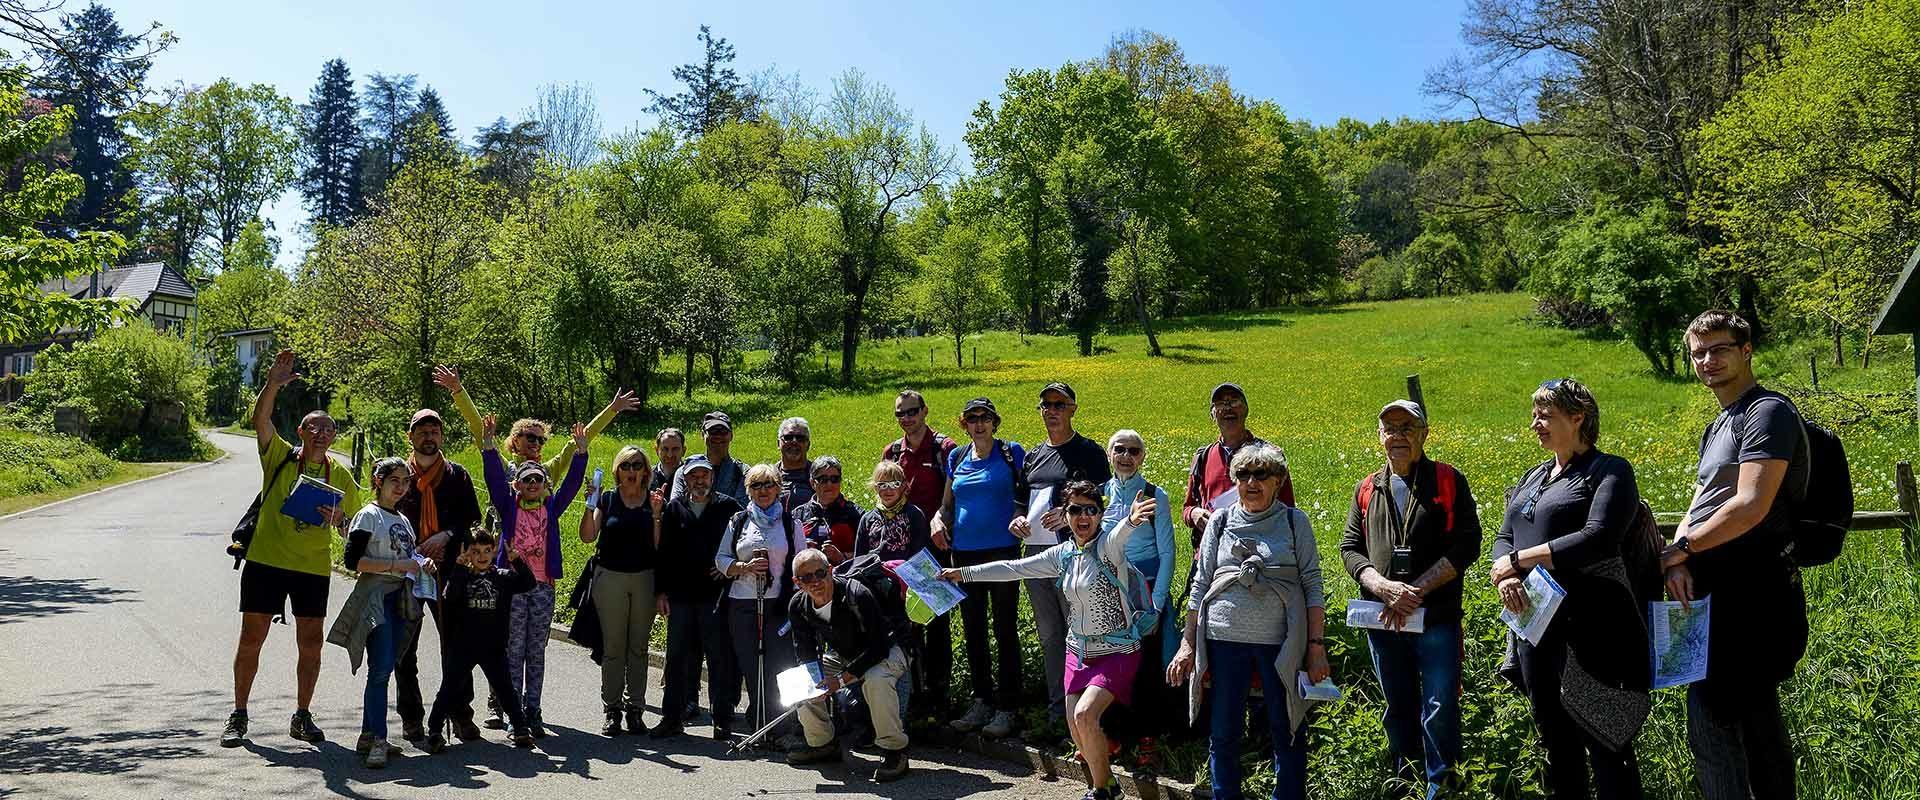 Initiation marche d'orientation du 1er mai 2019 à Wattwiller